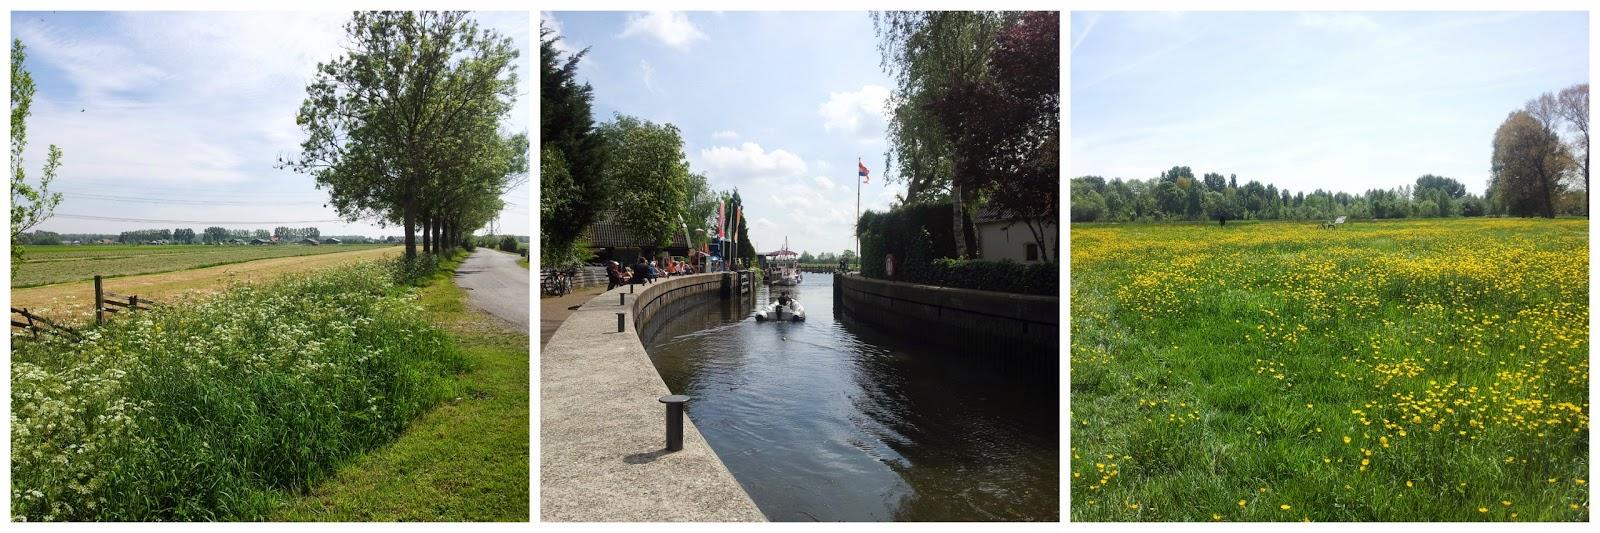 landvanmelkenhoning.blogspot.nl Terugblik op de maand mei